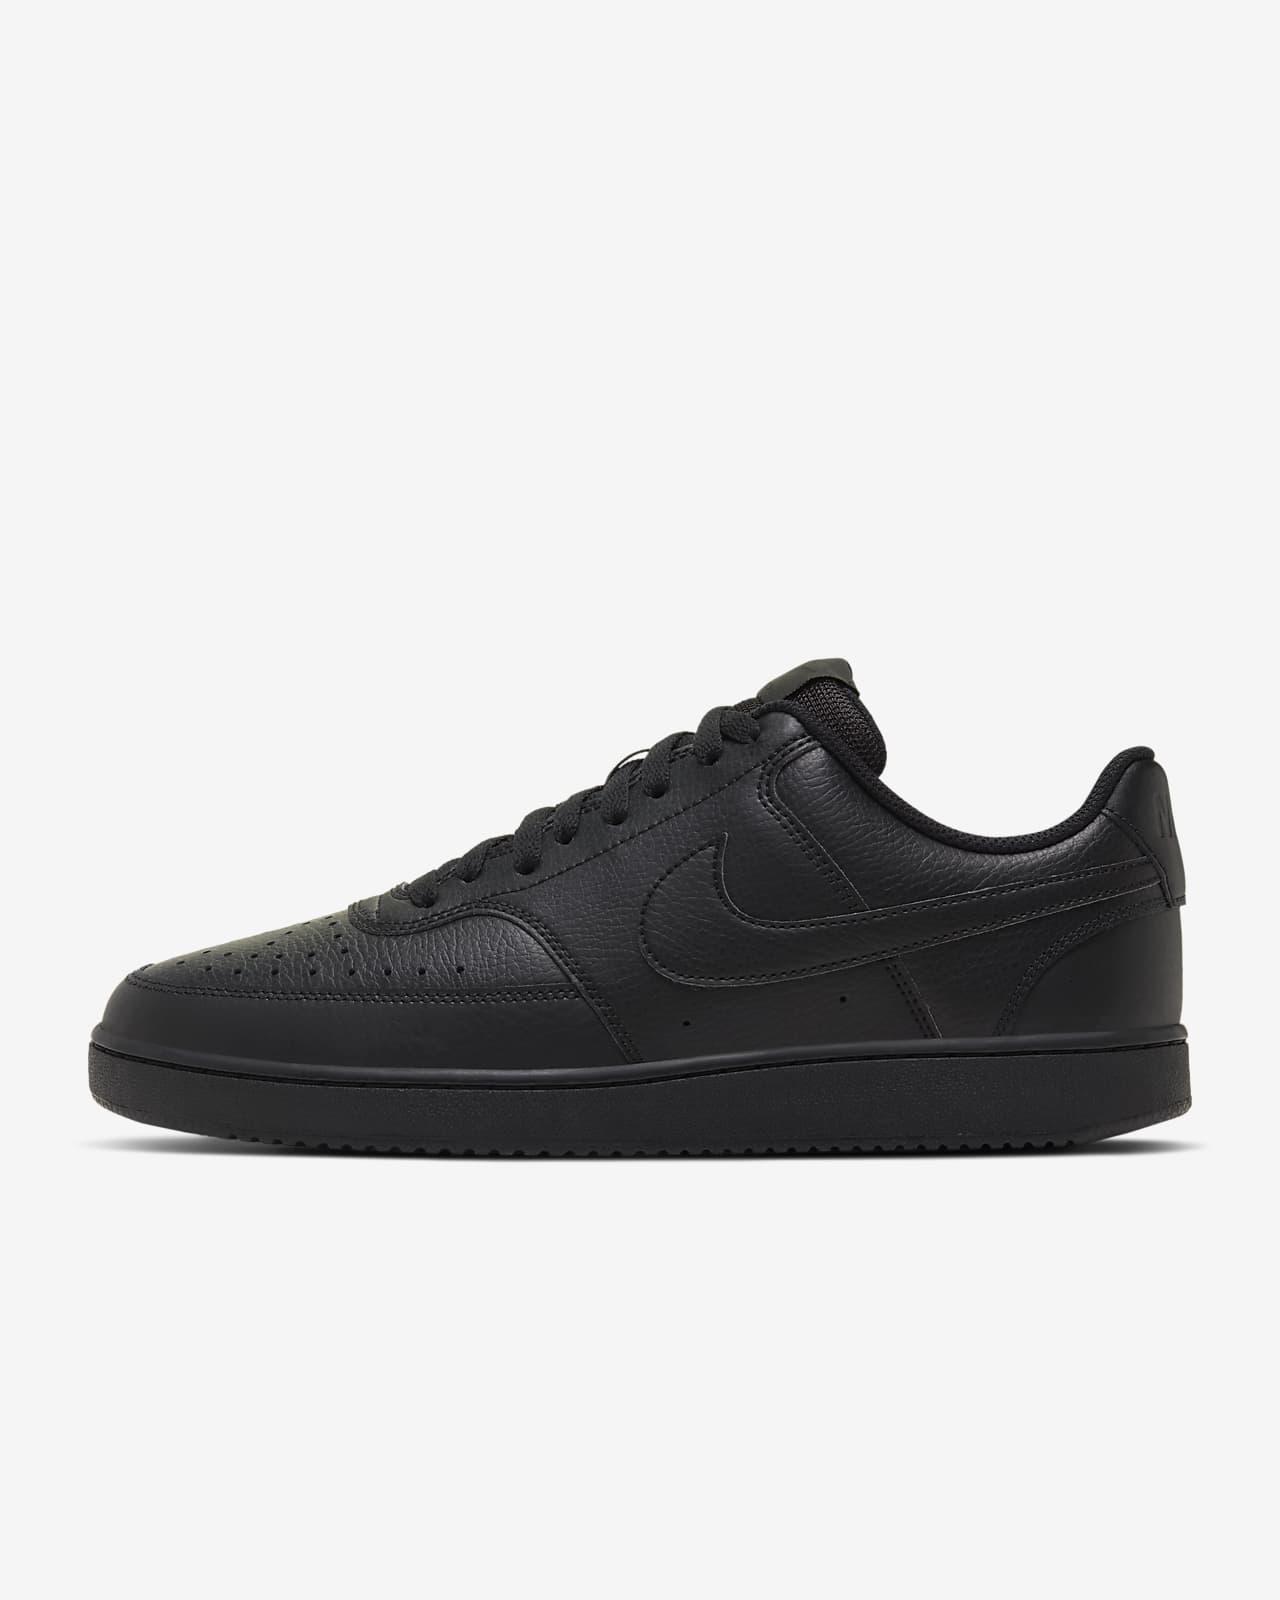 Calzado Nike Court Vision Low